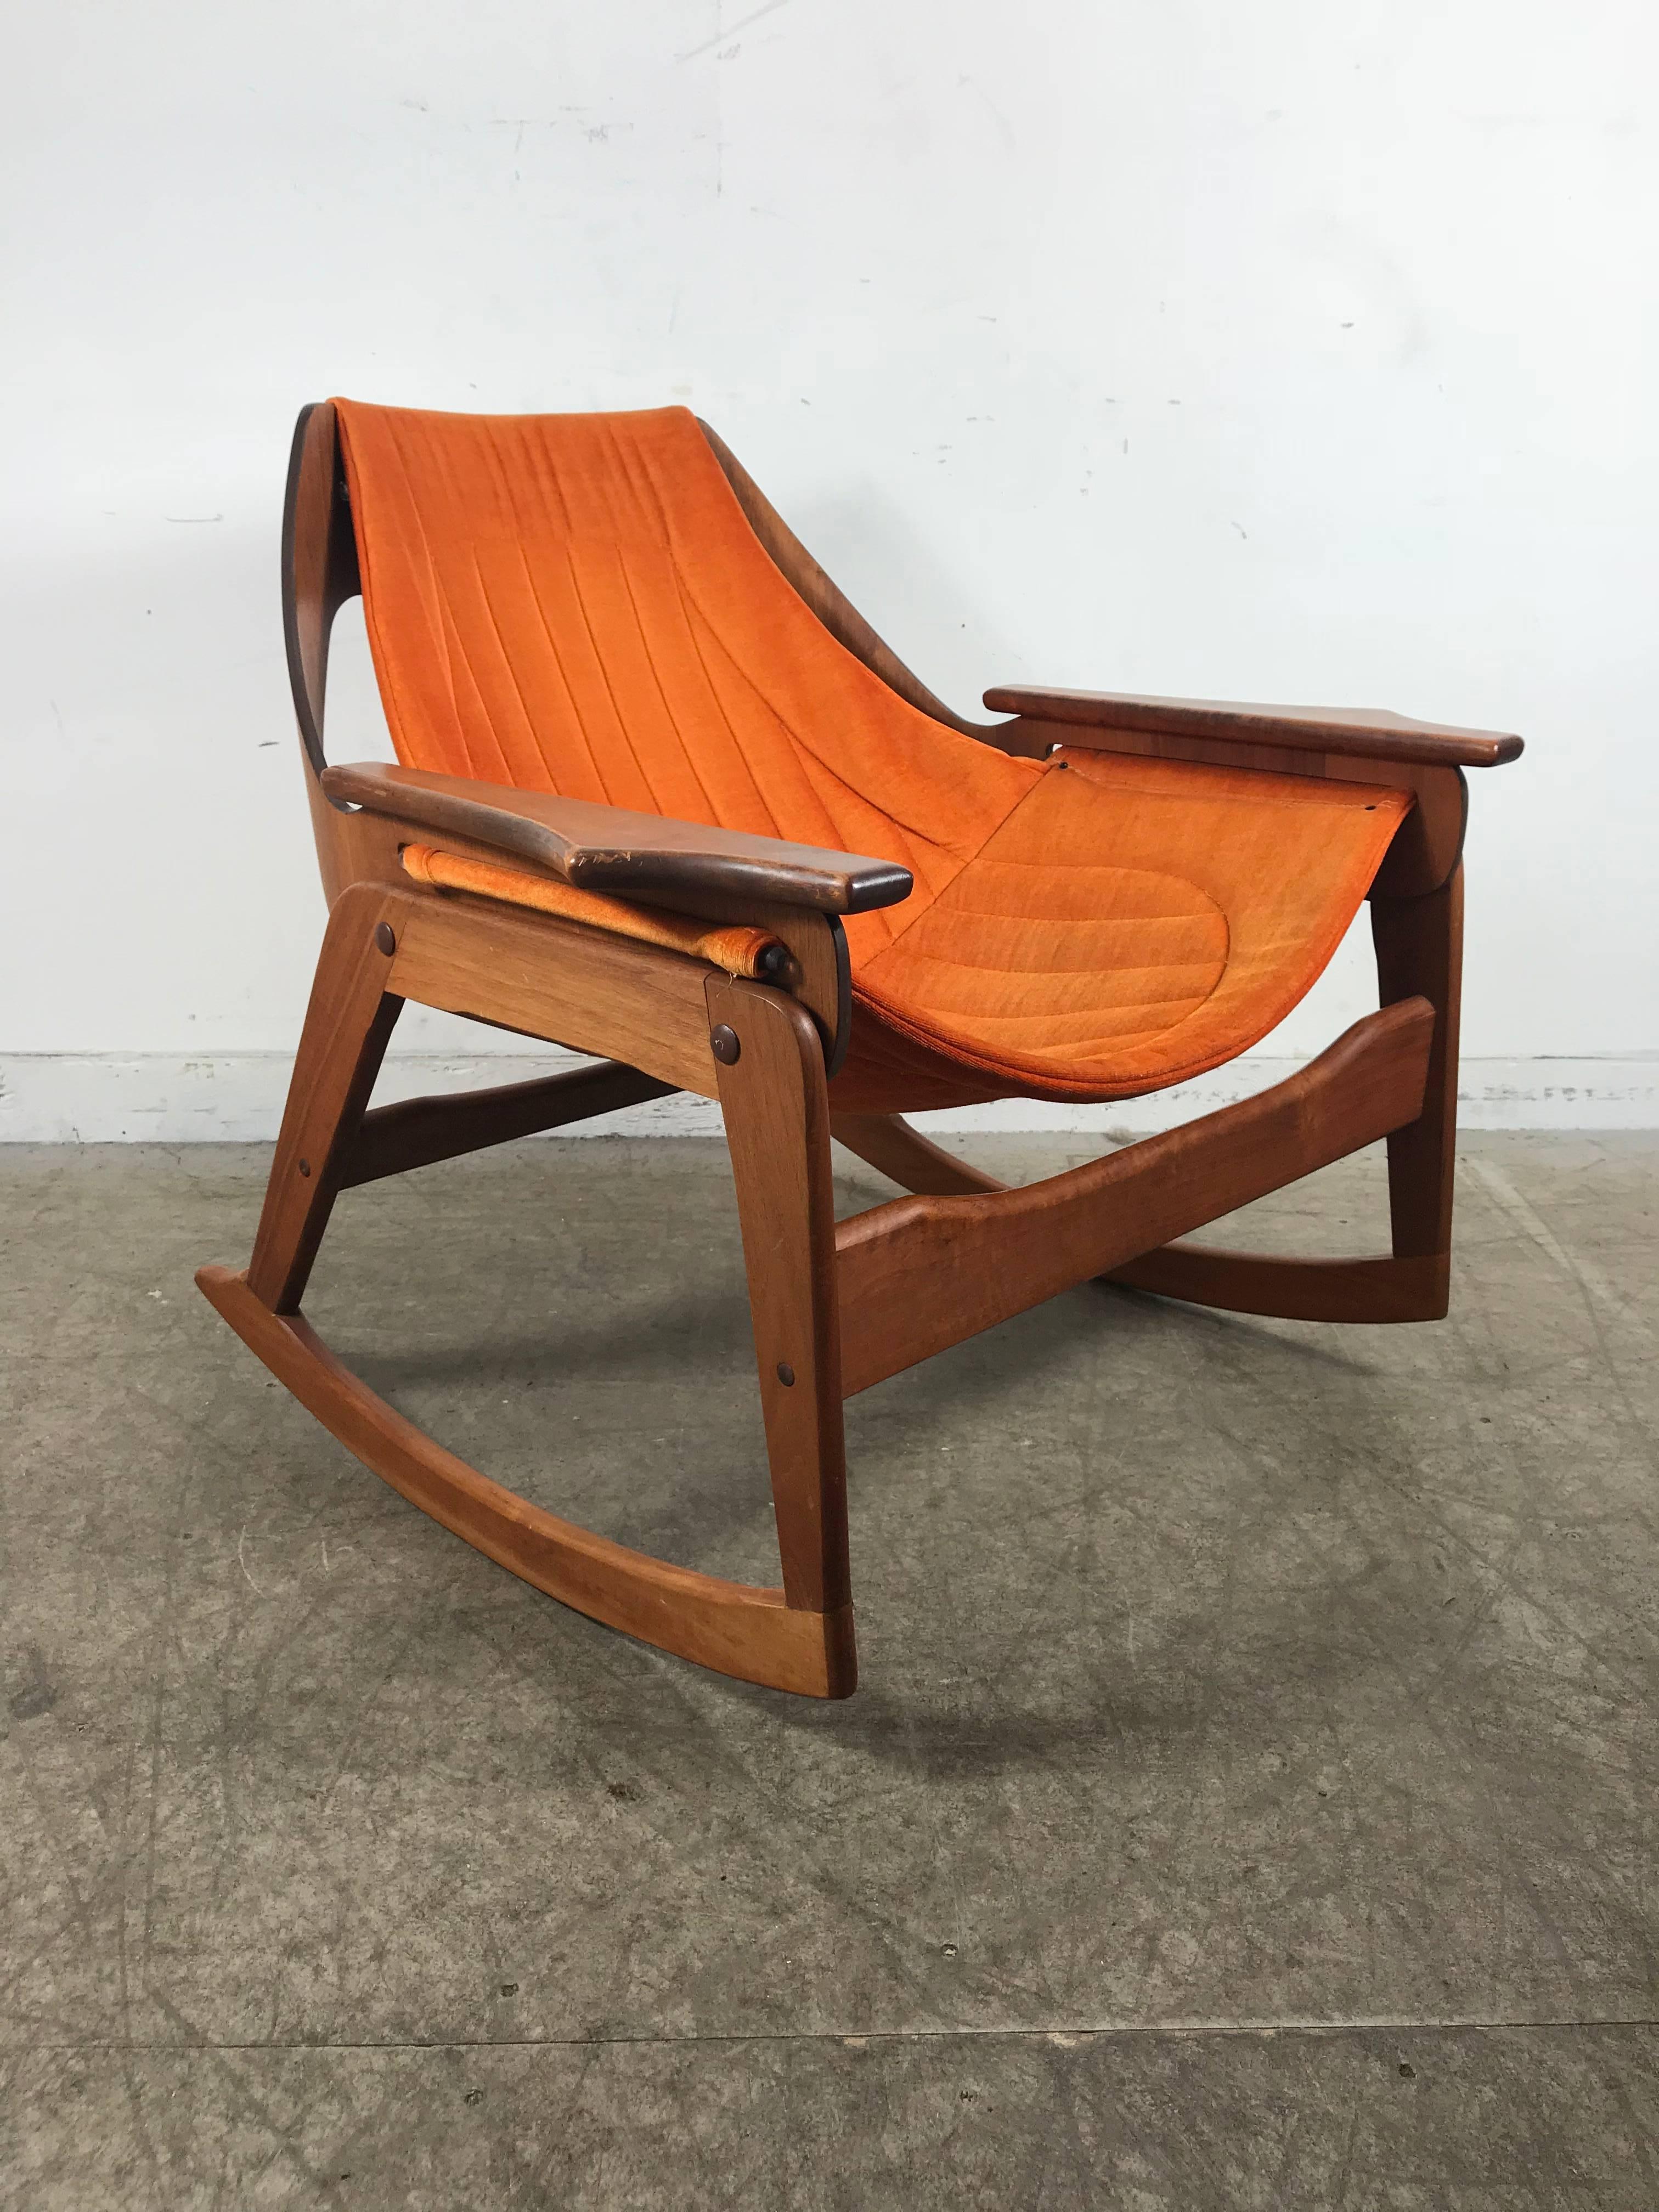 Mid Century Modern Rare Jerry Johnson Midcentury Walnut Sling Rocking Chair,  1960s For Sale